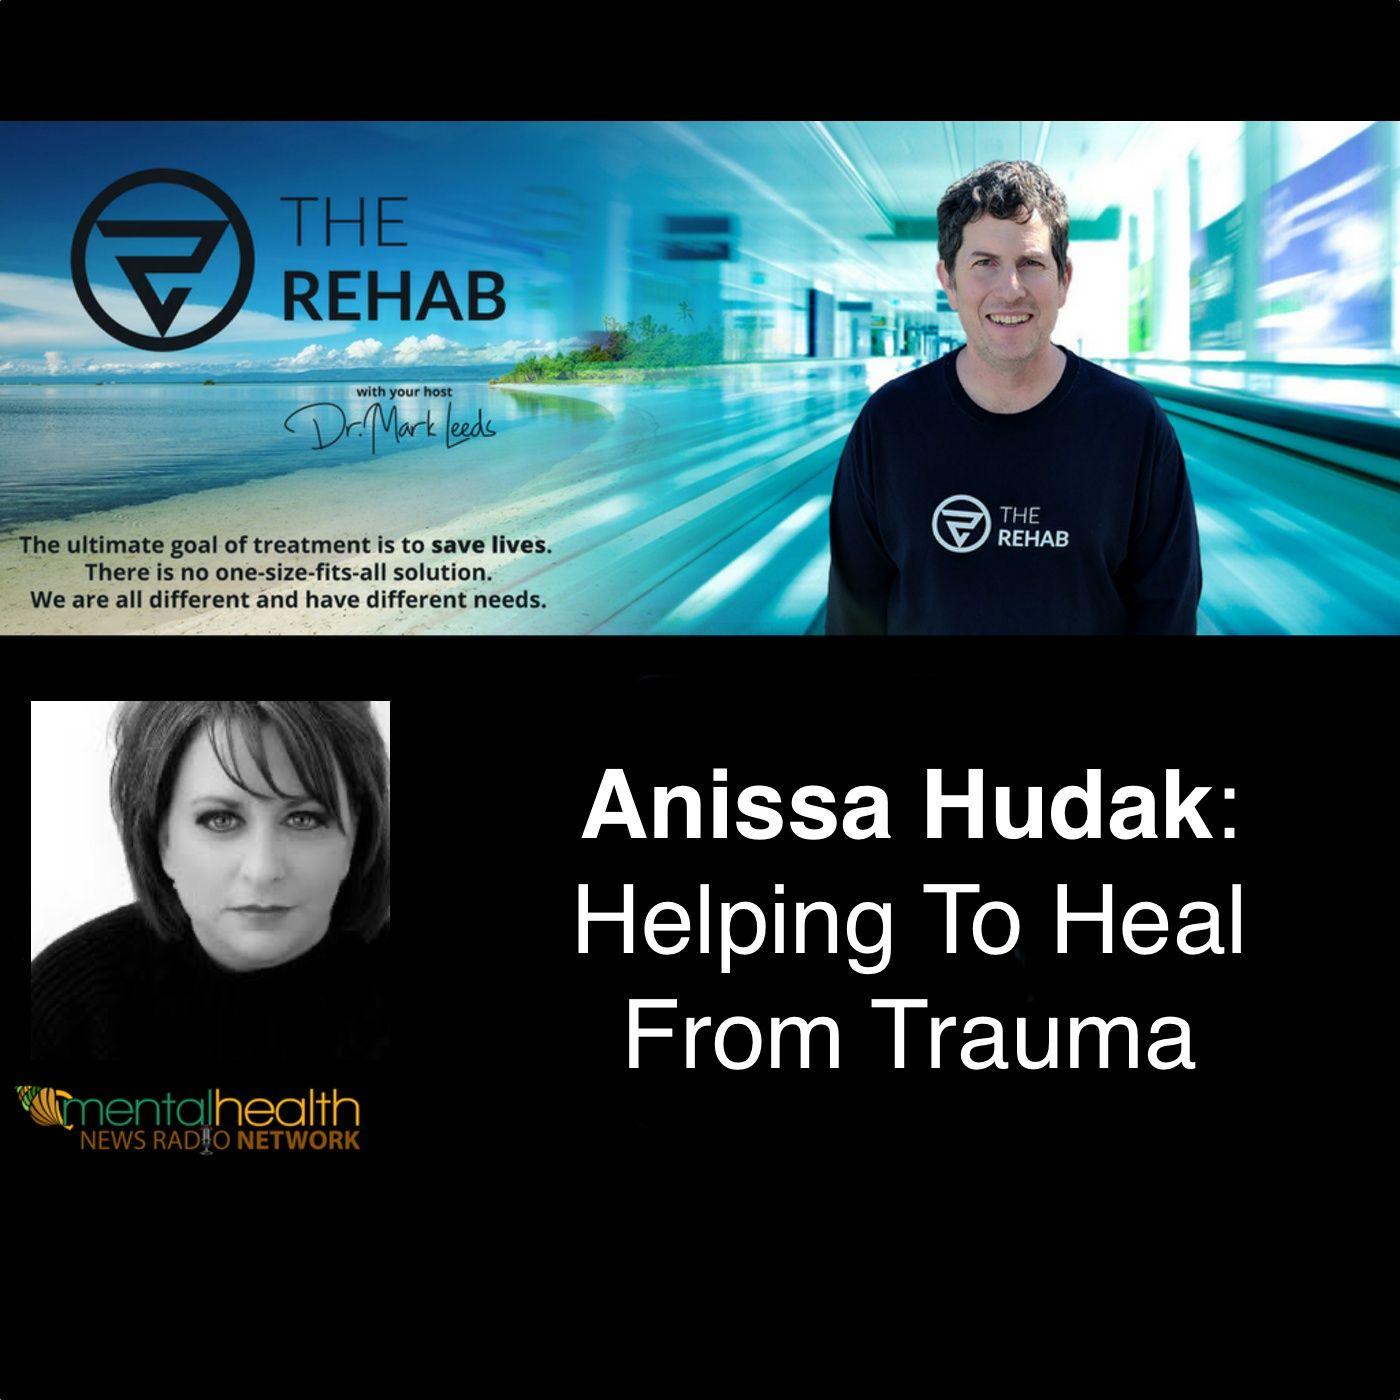 Anissa Hudak: Helping To Heal From Trauma